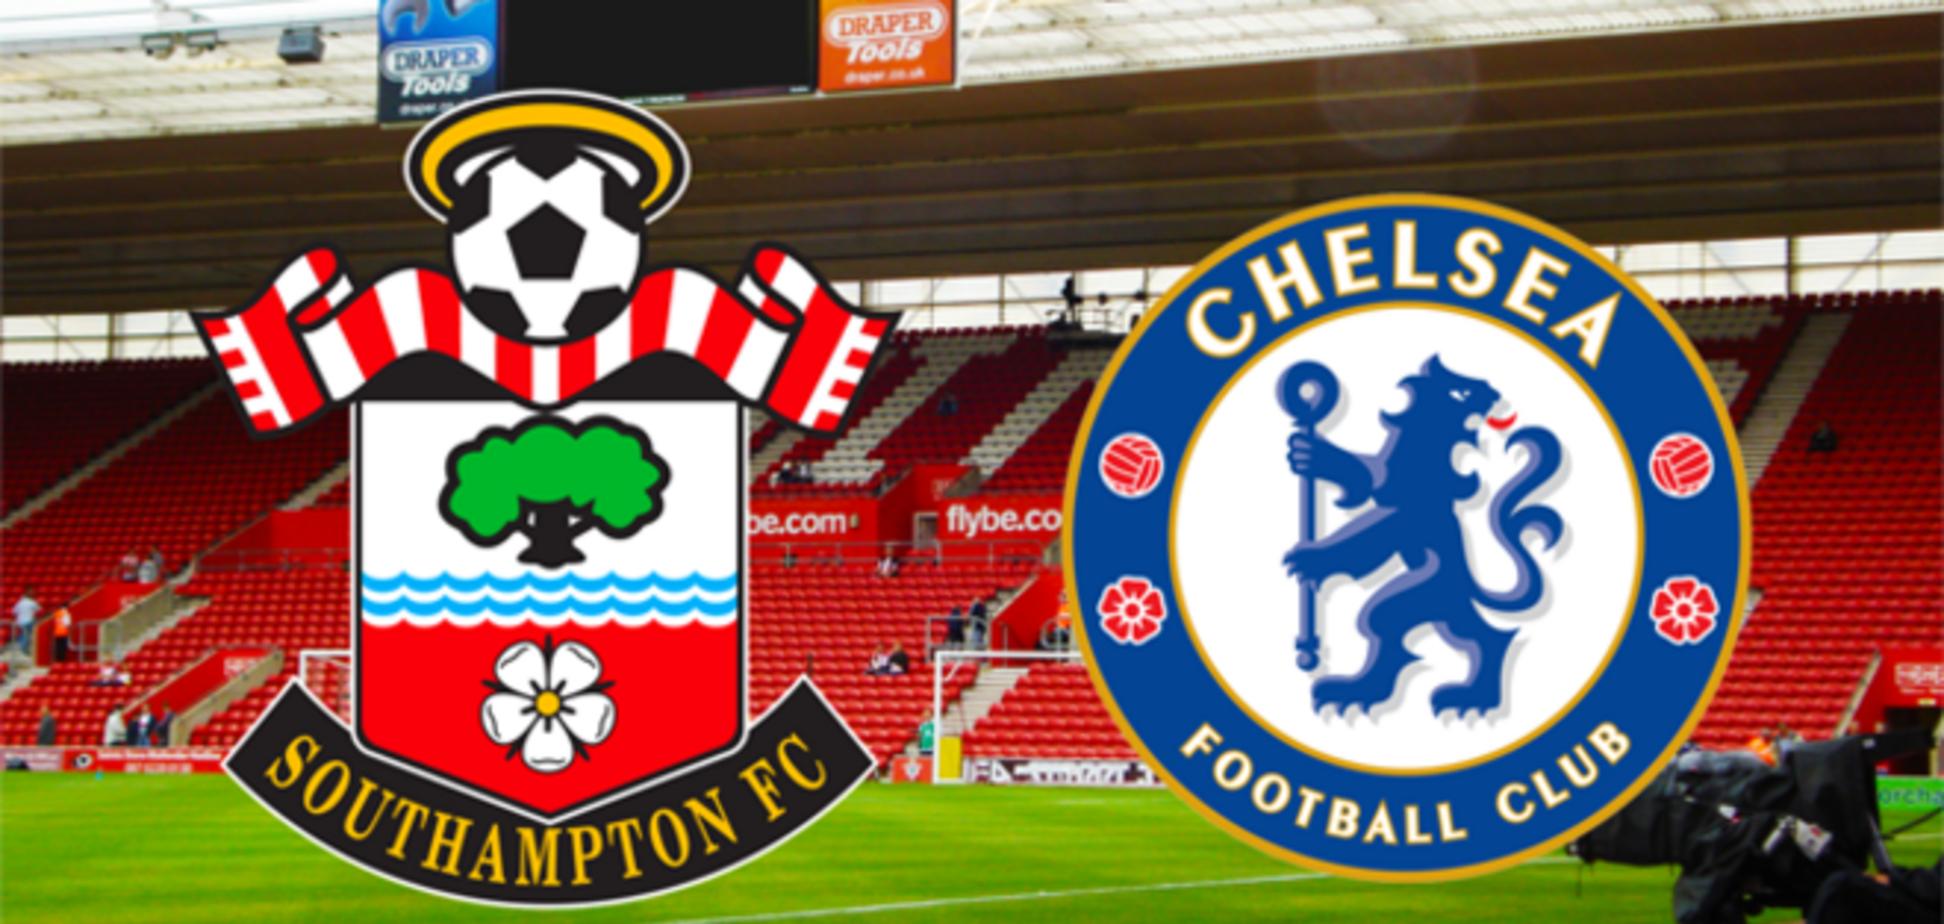 Саутгемптон - Челси - 1-1: осечка лидера